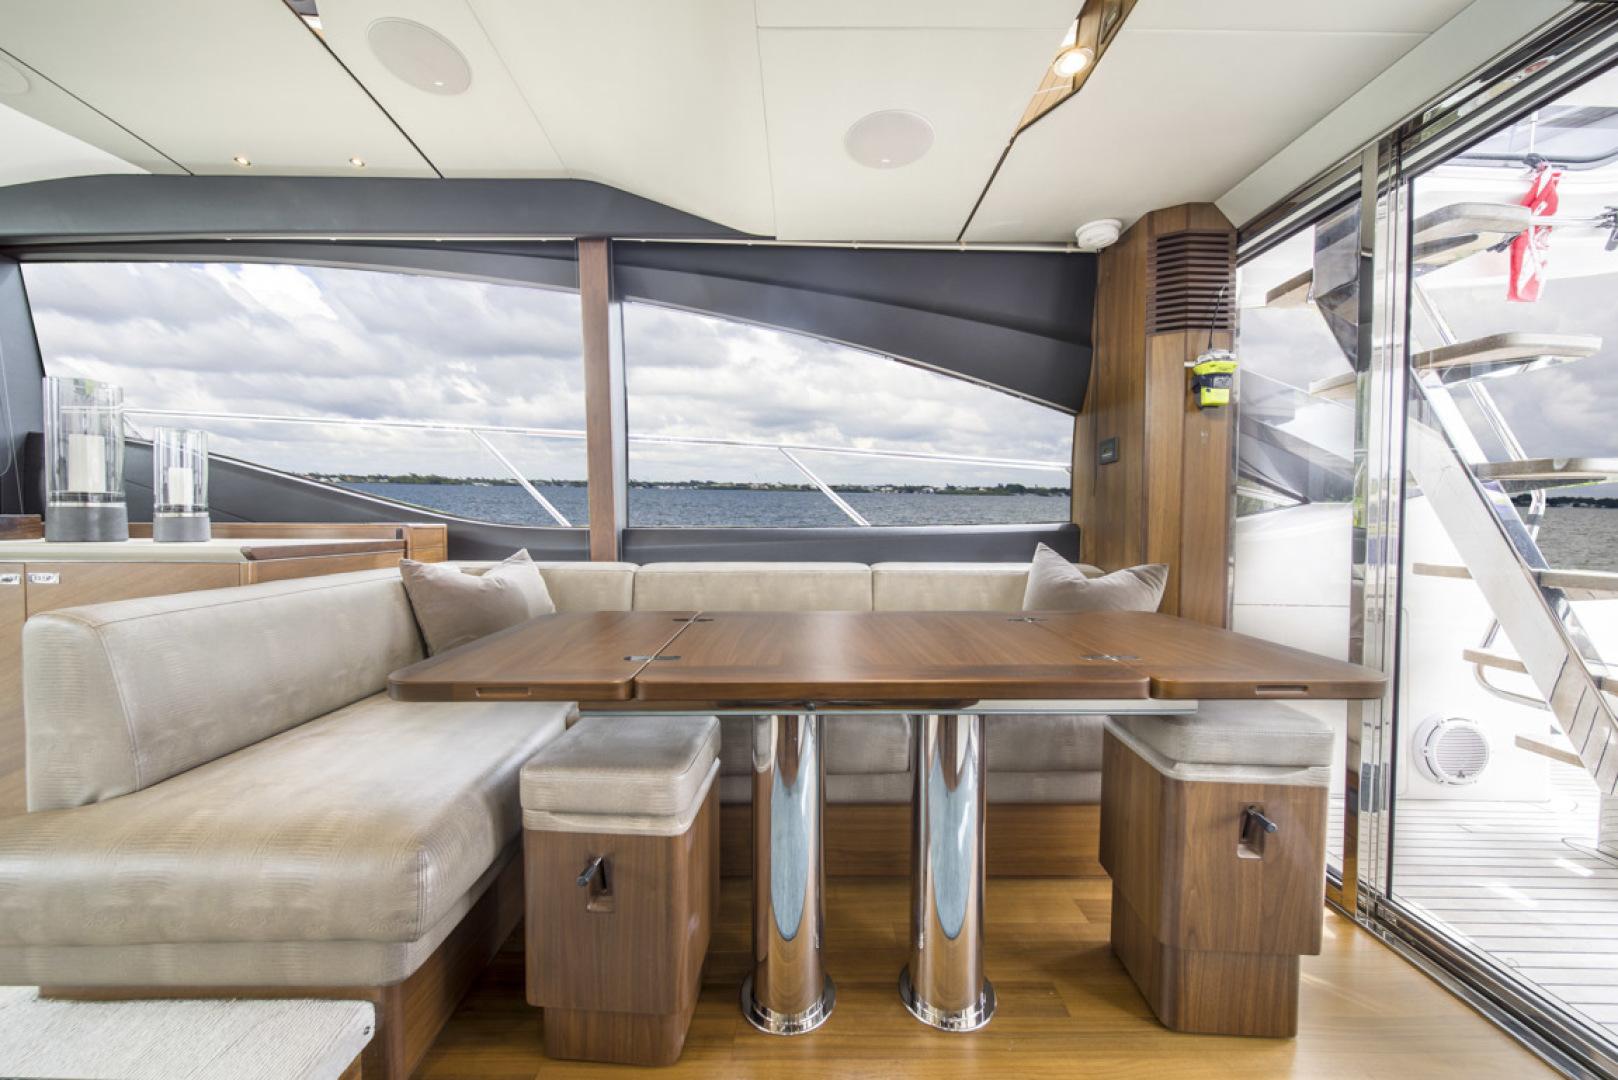 Princess-S65 2019-Paragon Cape Coral-Florida-United States-2019 65 Princess S65-Paragon-Dinette-1509912 | Thumbnail